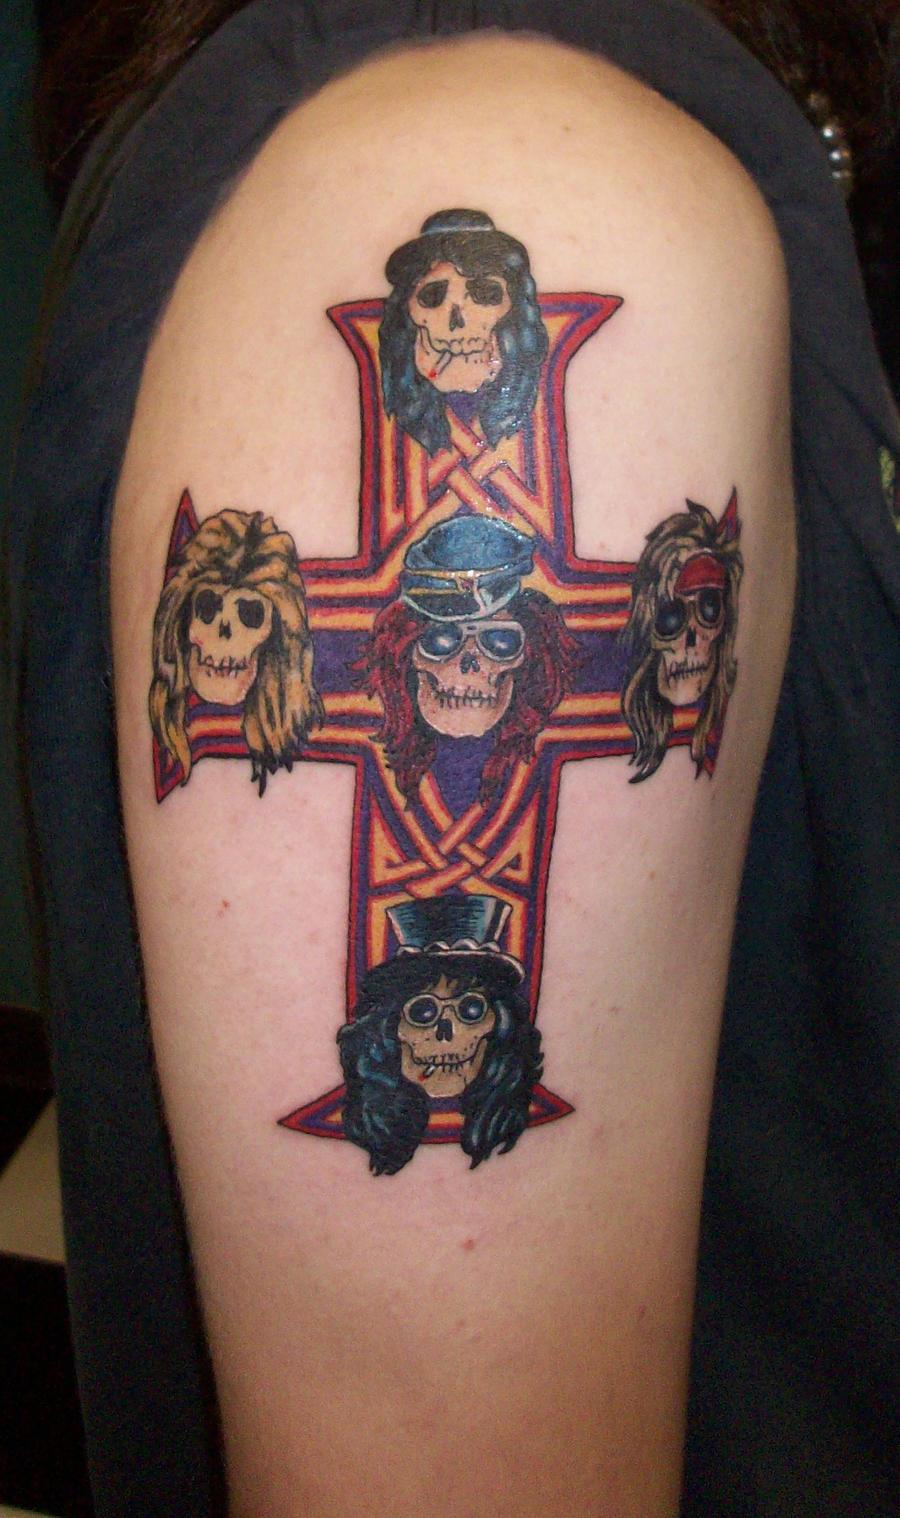 Guns and roses cross by johnnyjinx on deviantart for Guns n roses tattoos